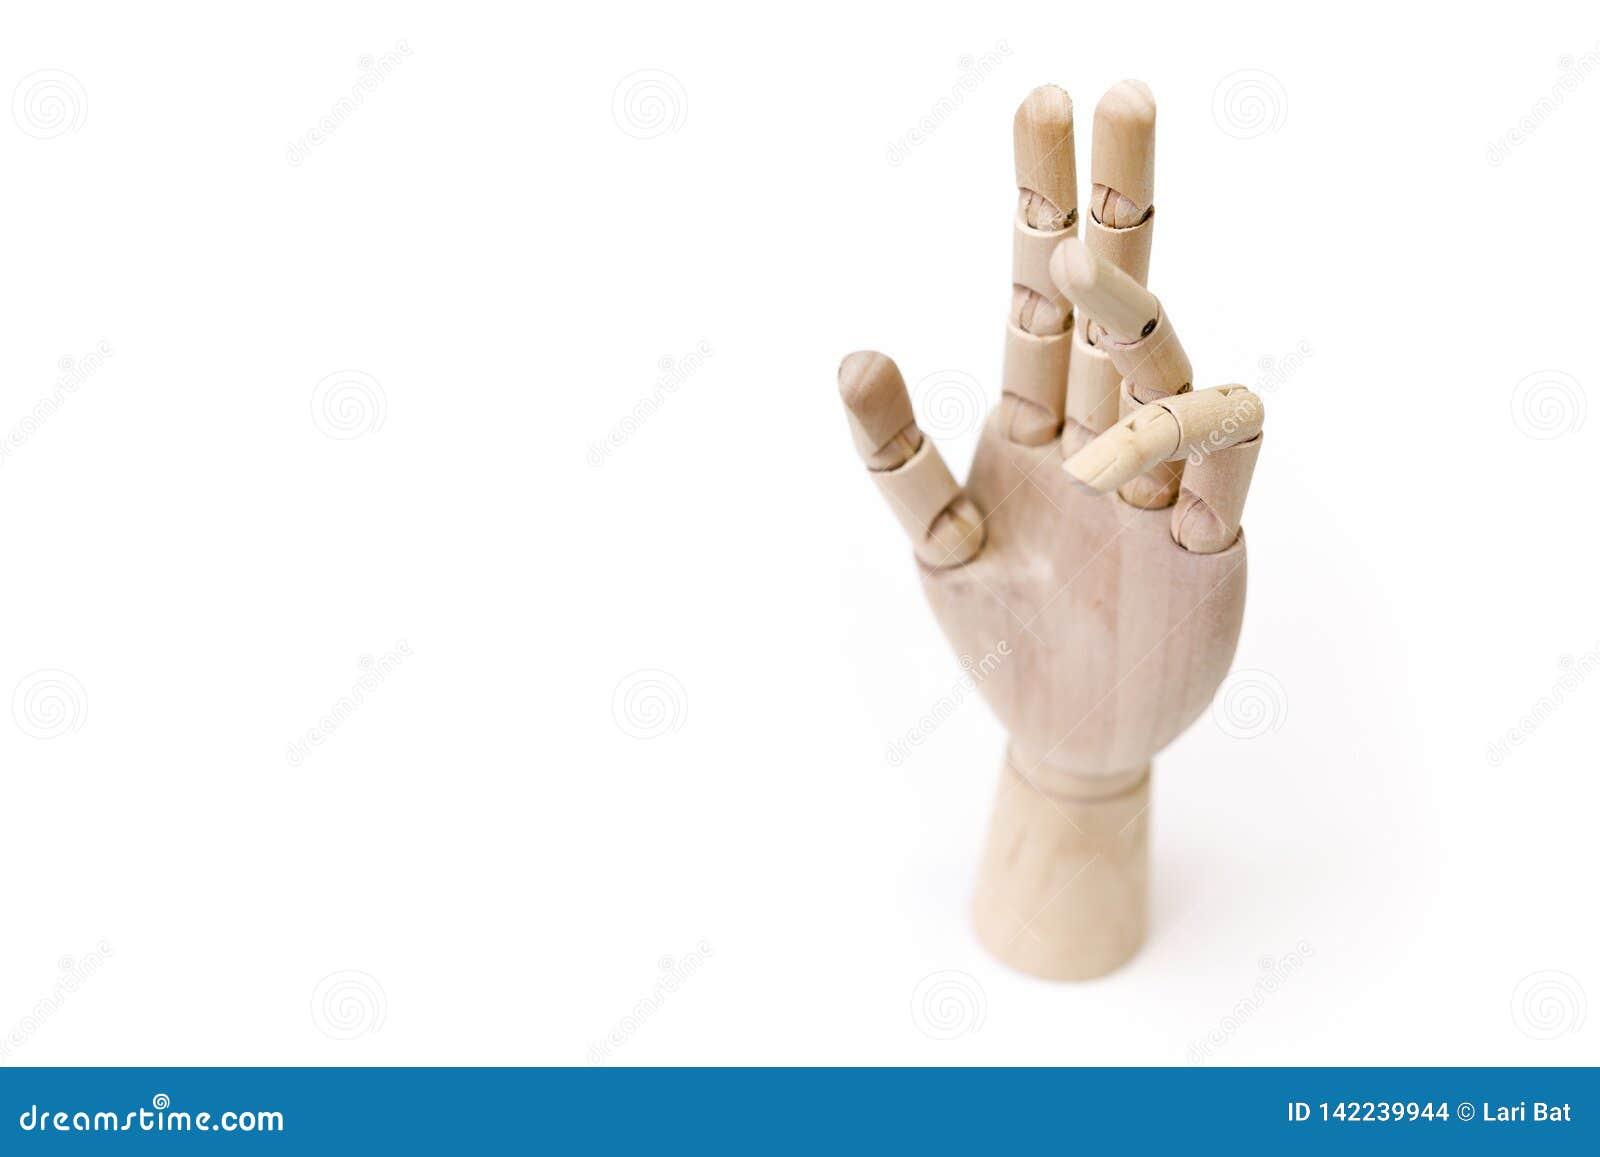 Wooden hands with gesture